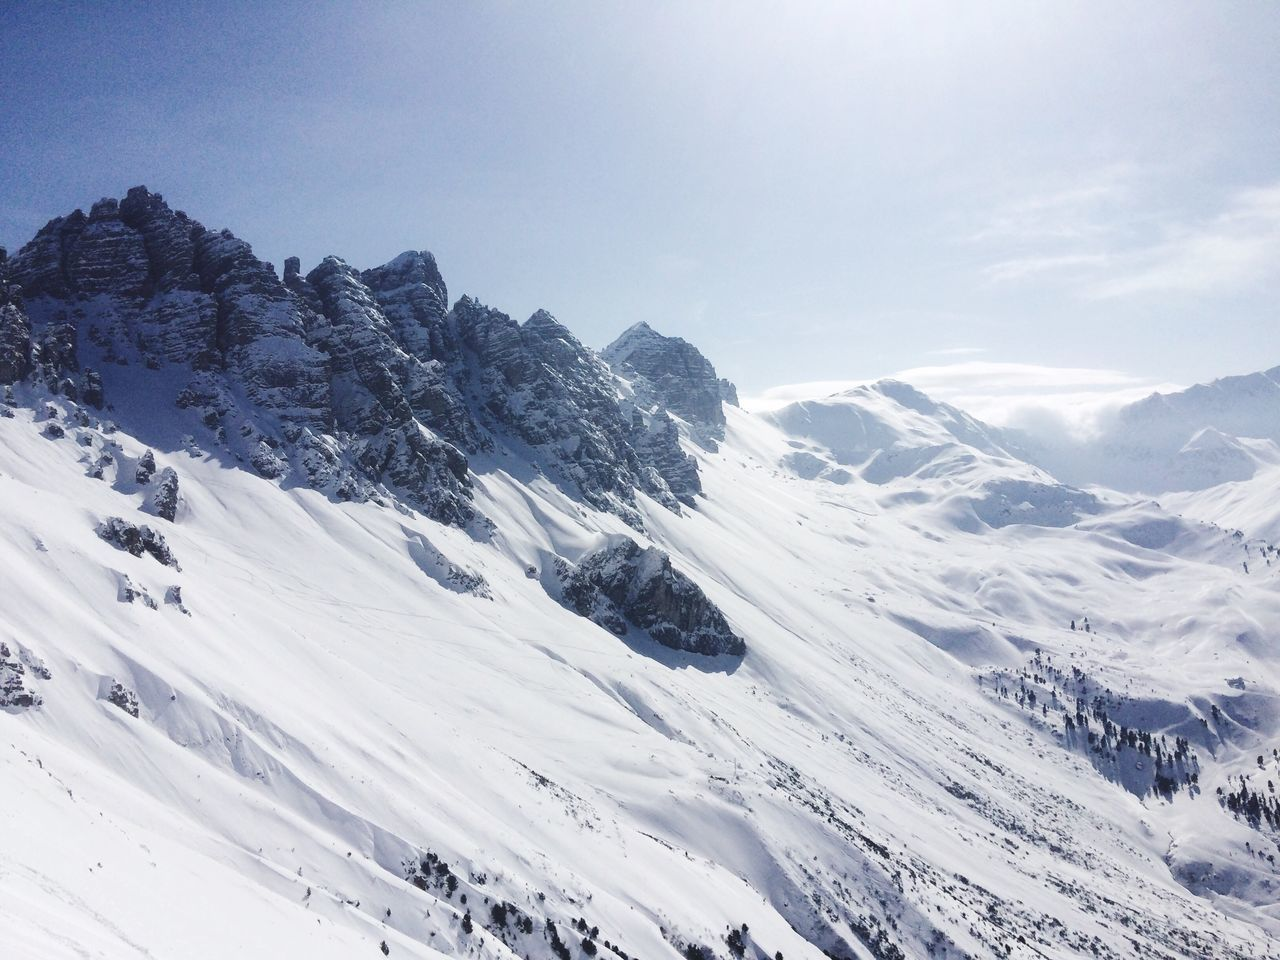 AxamerLizum Freizeitticket Fun Skiing Sun That's Me Check This Out Cheese! Relaxing Taking Photos Enjoying Life